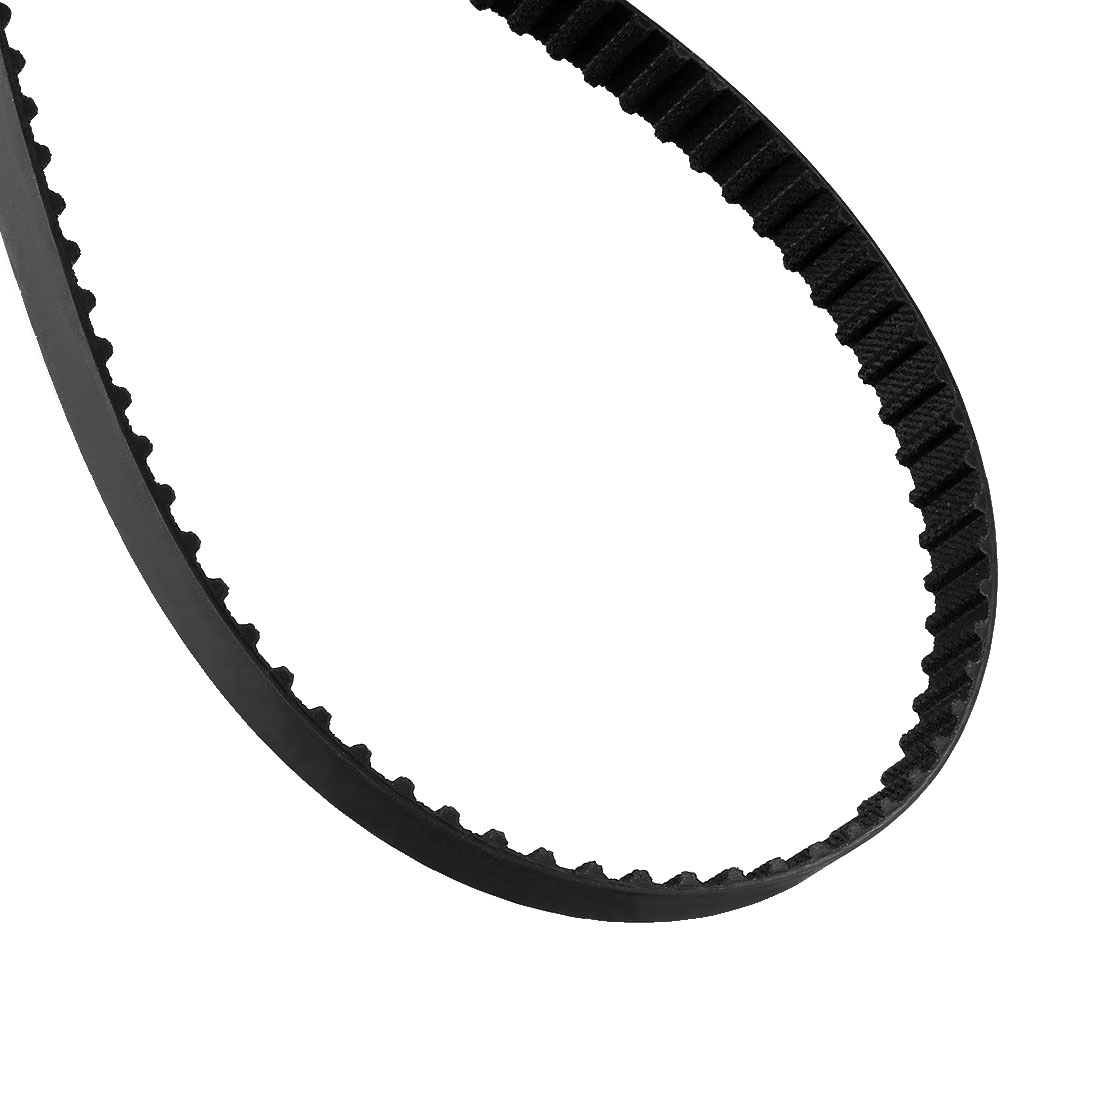 522XL 261 Teeth 10mm Width 5.08mm Pitch Stepper Motor Rubber Timing Belt Black